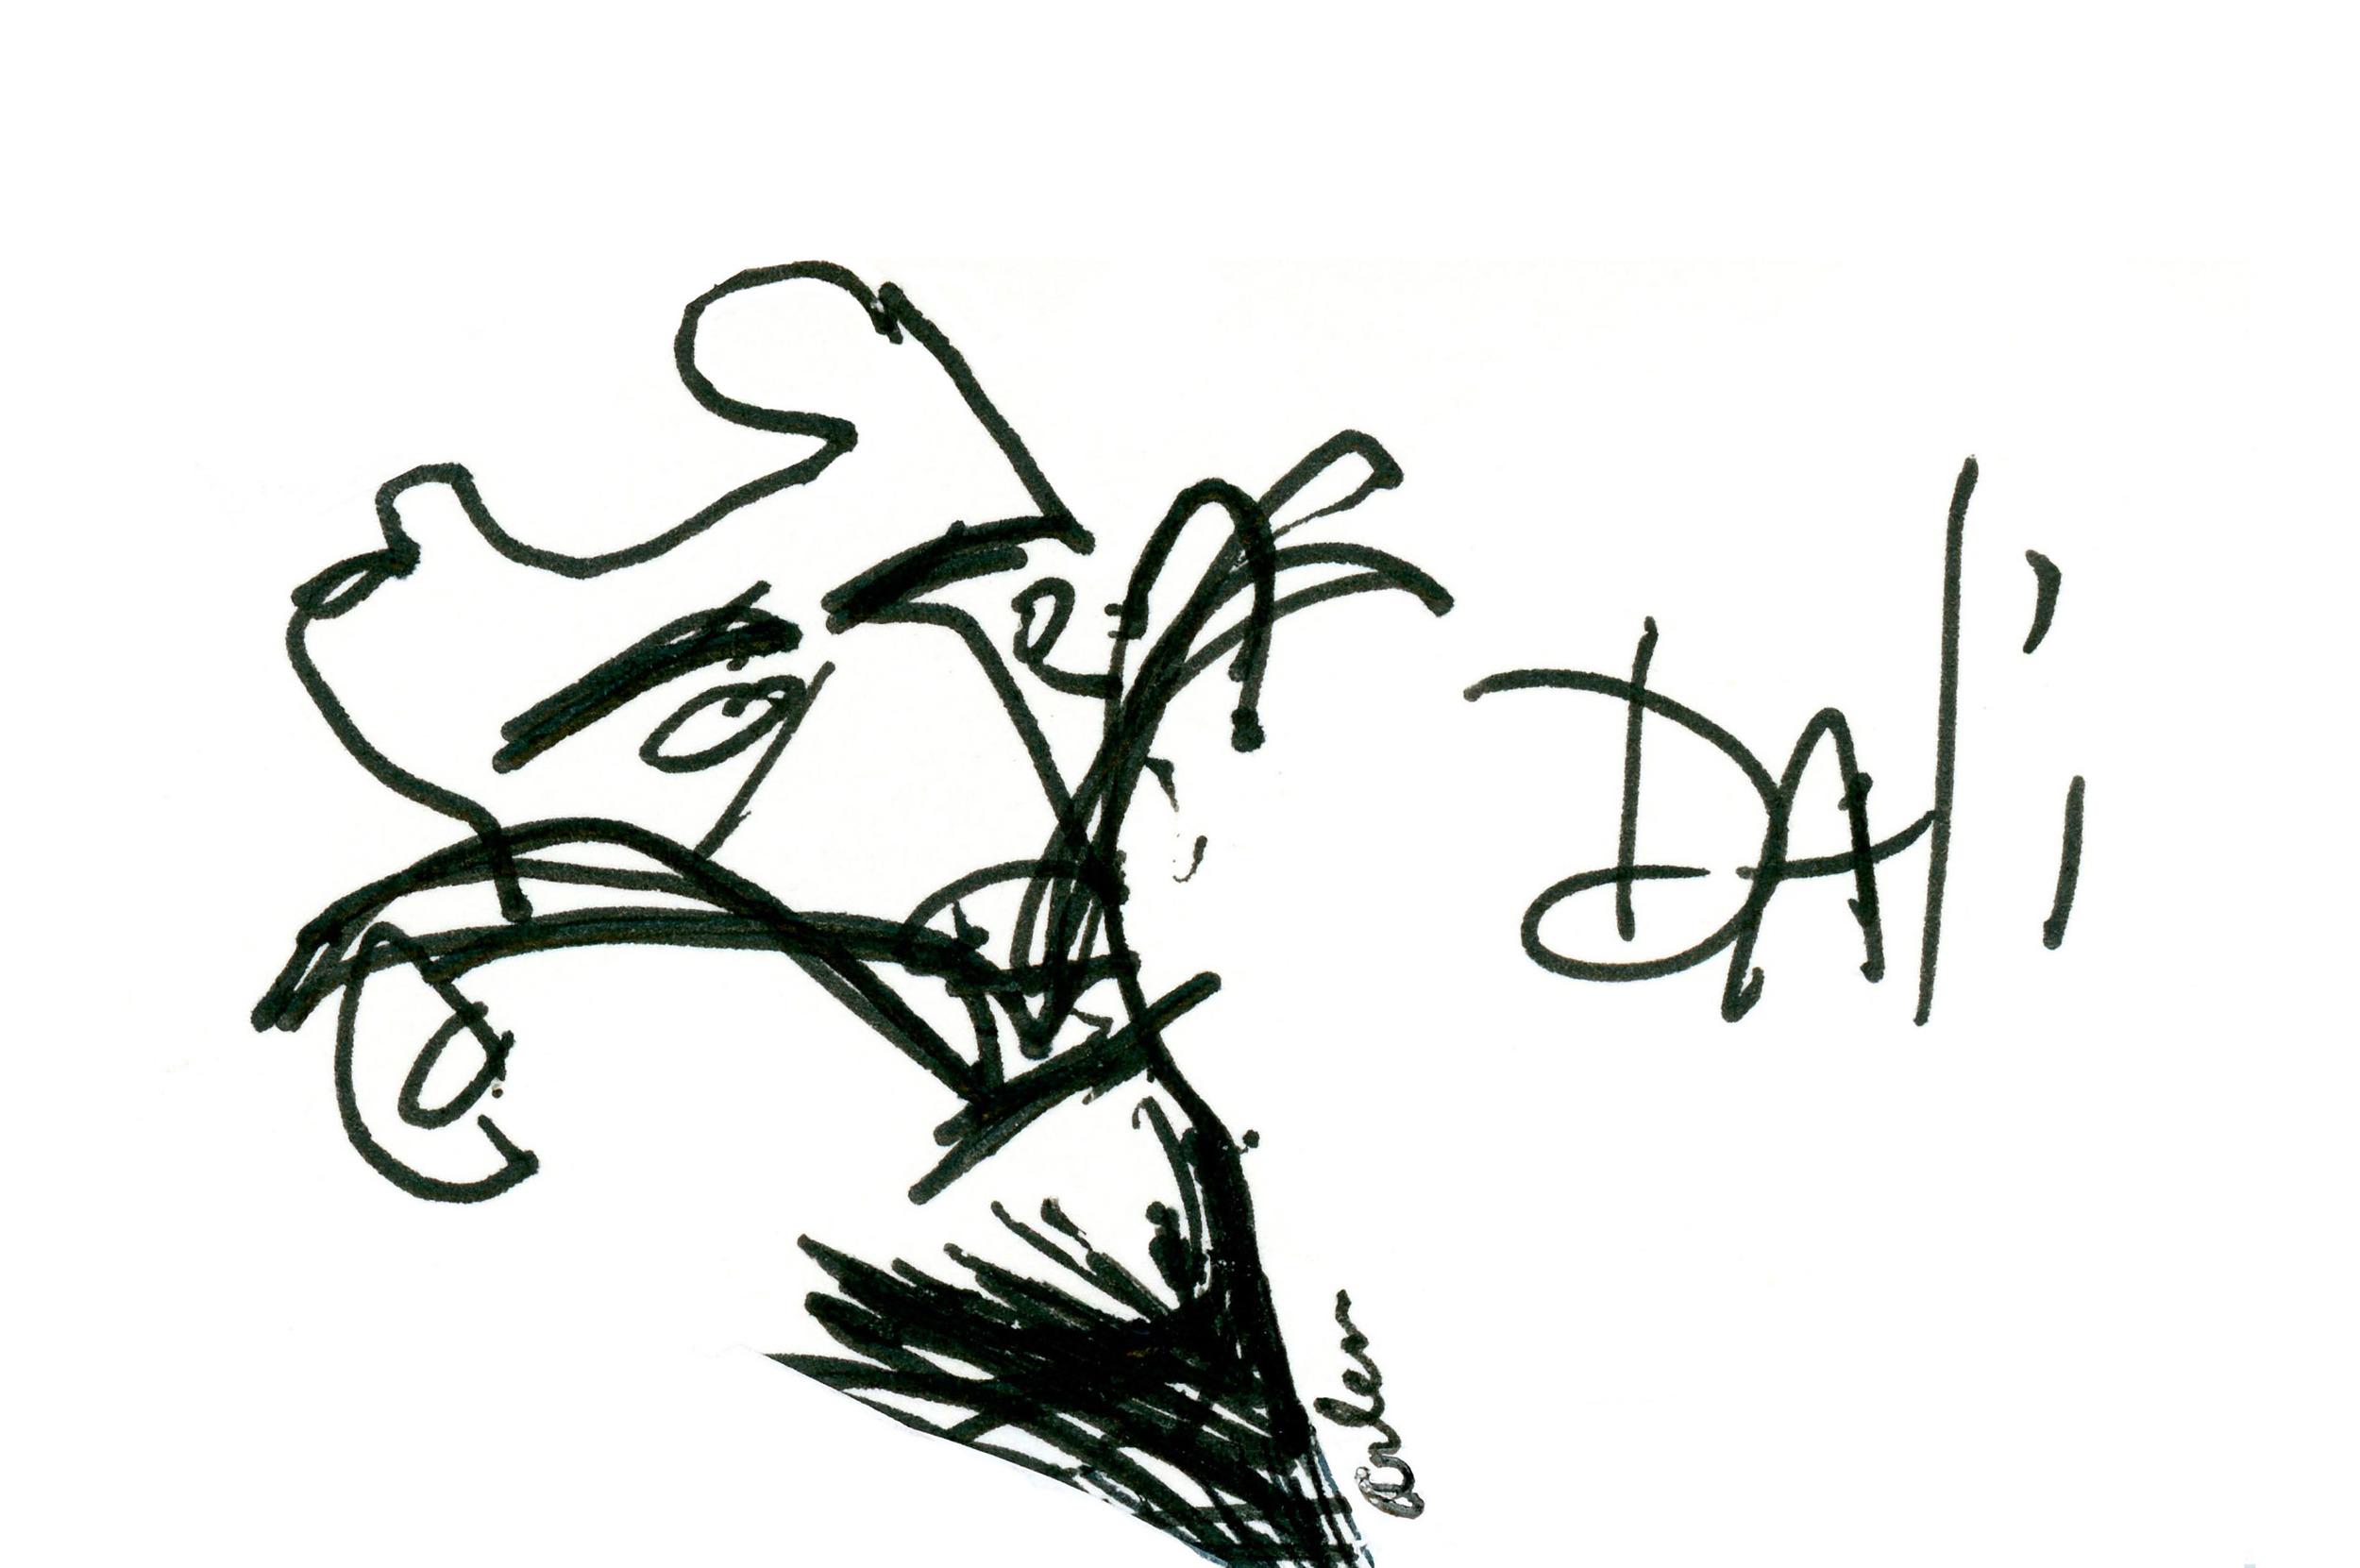 gllry_18-Dali_same-sz.jpg